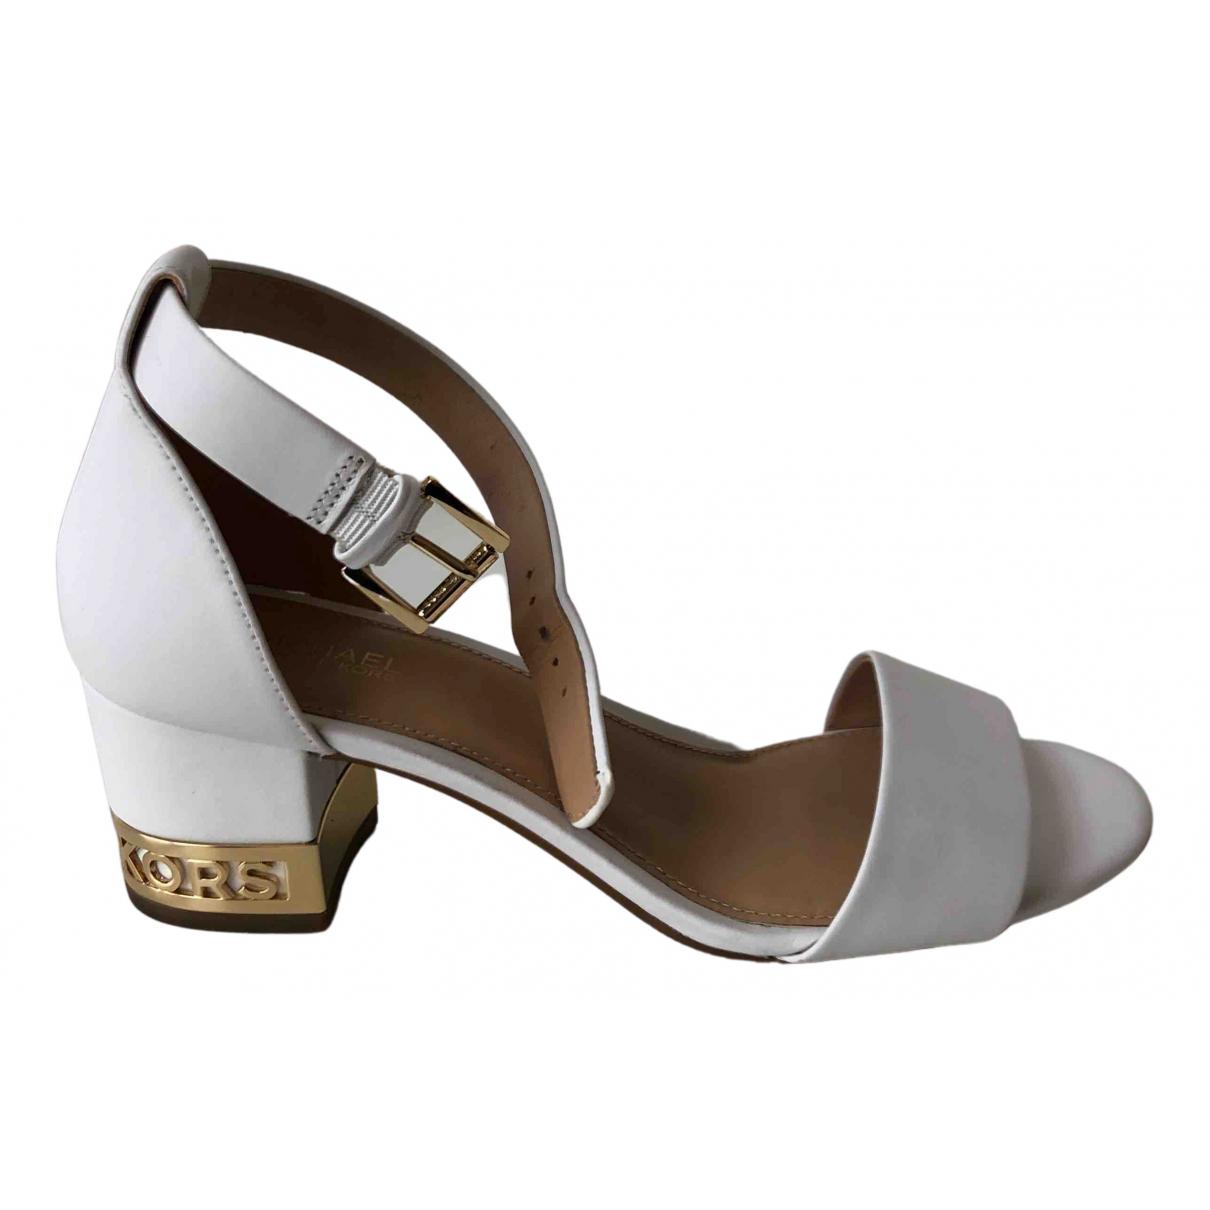 Michael Kors N White Leather Sandals for Women 6 US